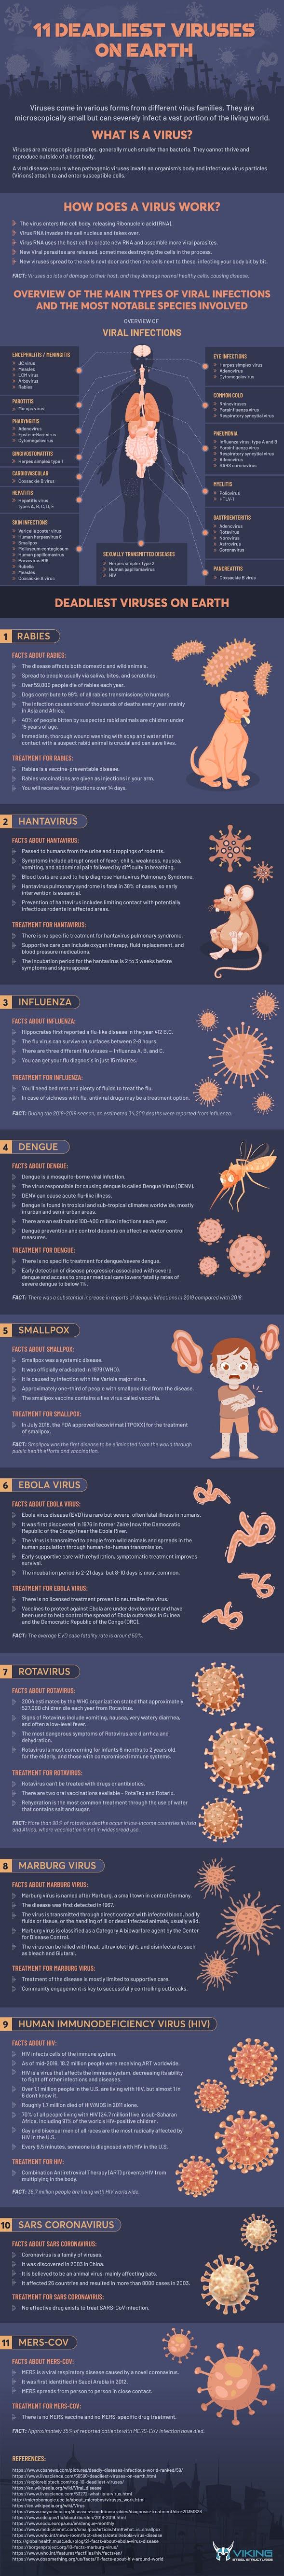 11 Deadliest Viruses On Earth #infographic